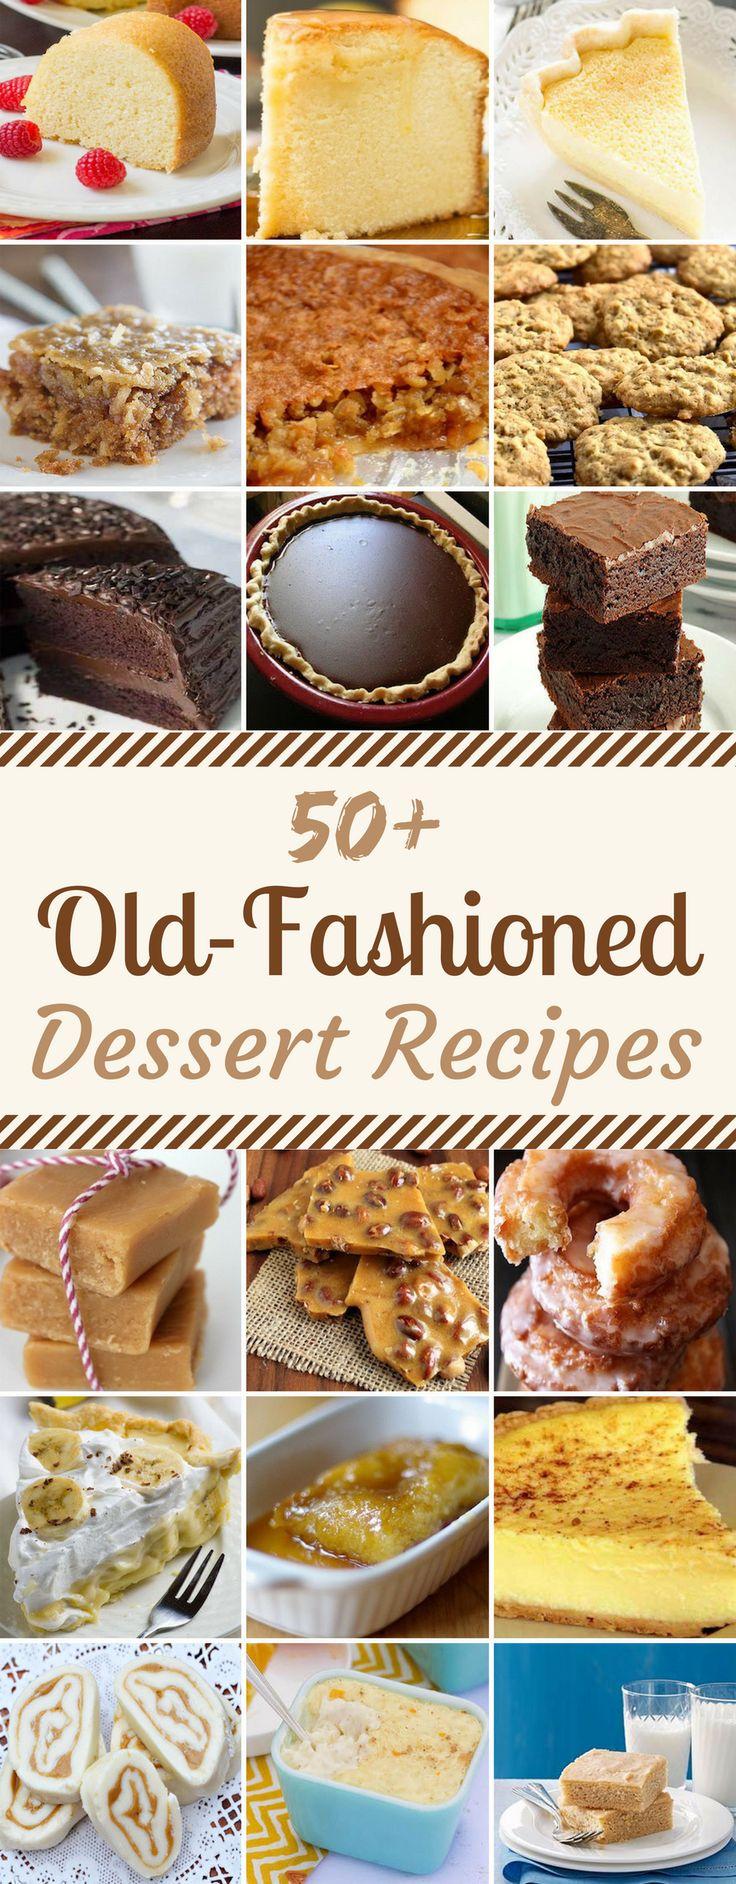 50 Old-Fashioned Dessert Recipes